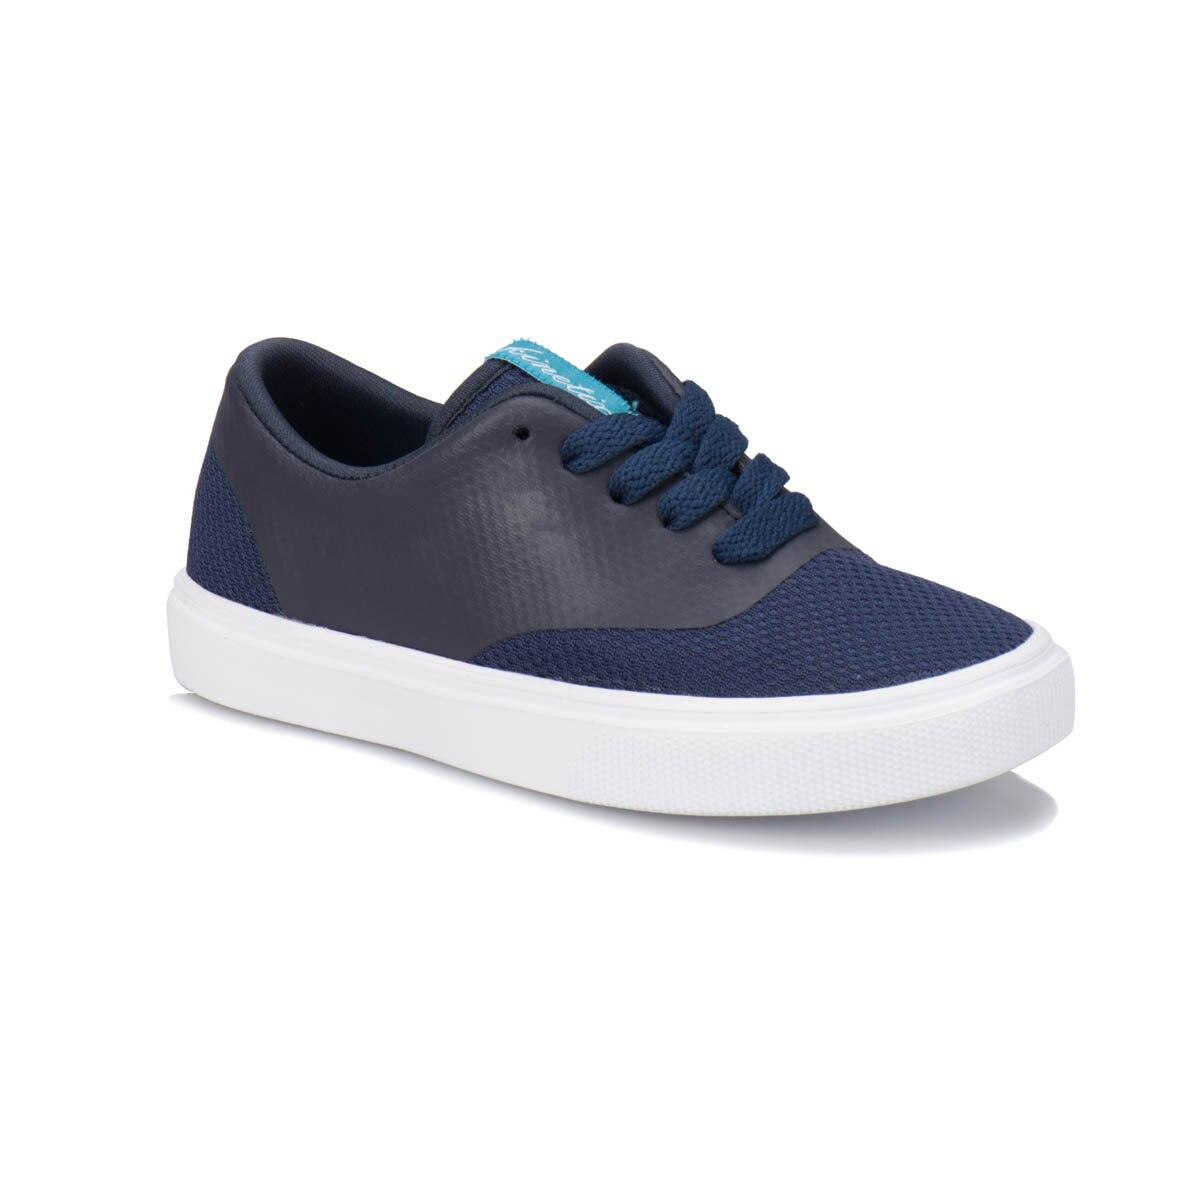 FLO GISELLA Navy Blue Male Child Sneaker Shoes KINETIX